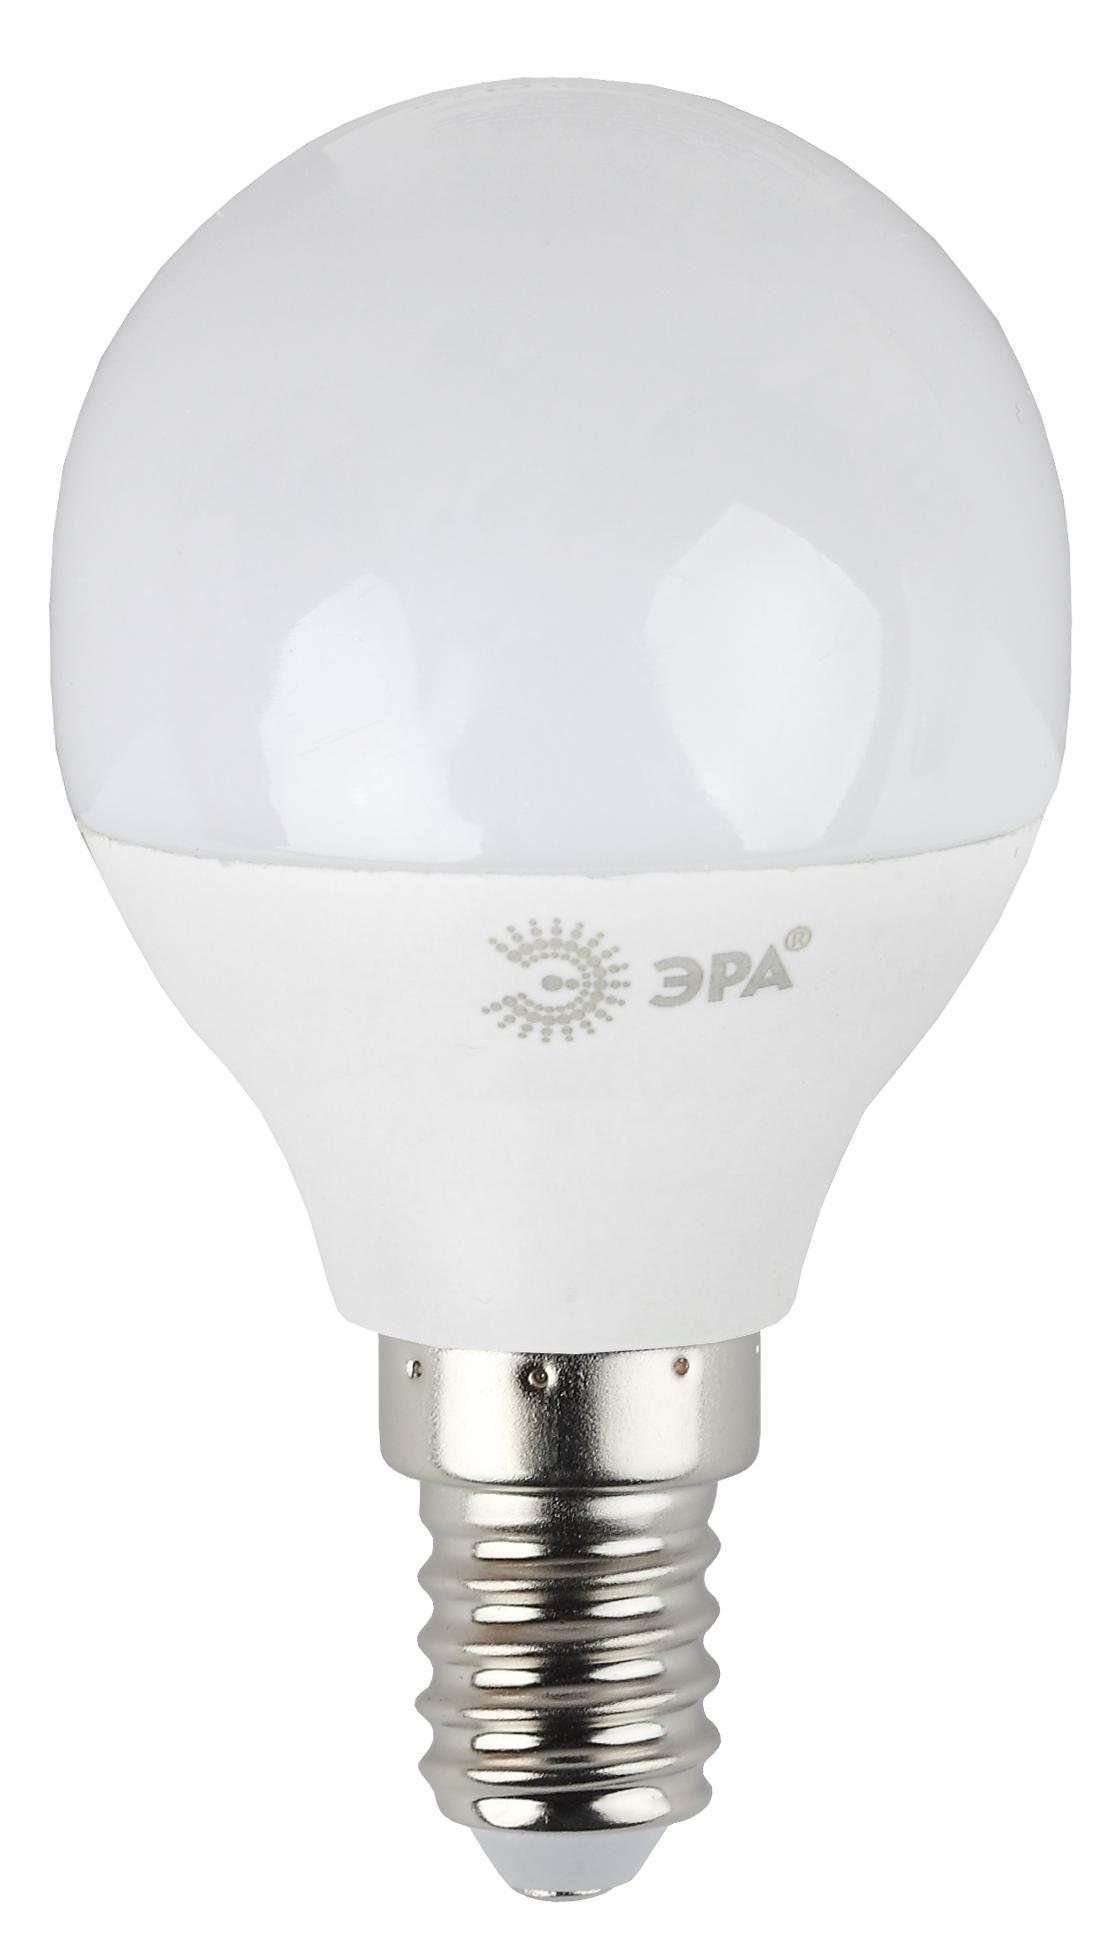 Лампа светодиодная ЭРА Led smd p45-7w-827-e14